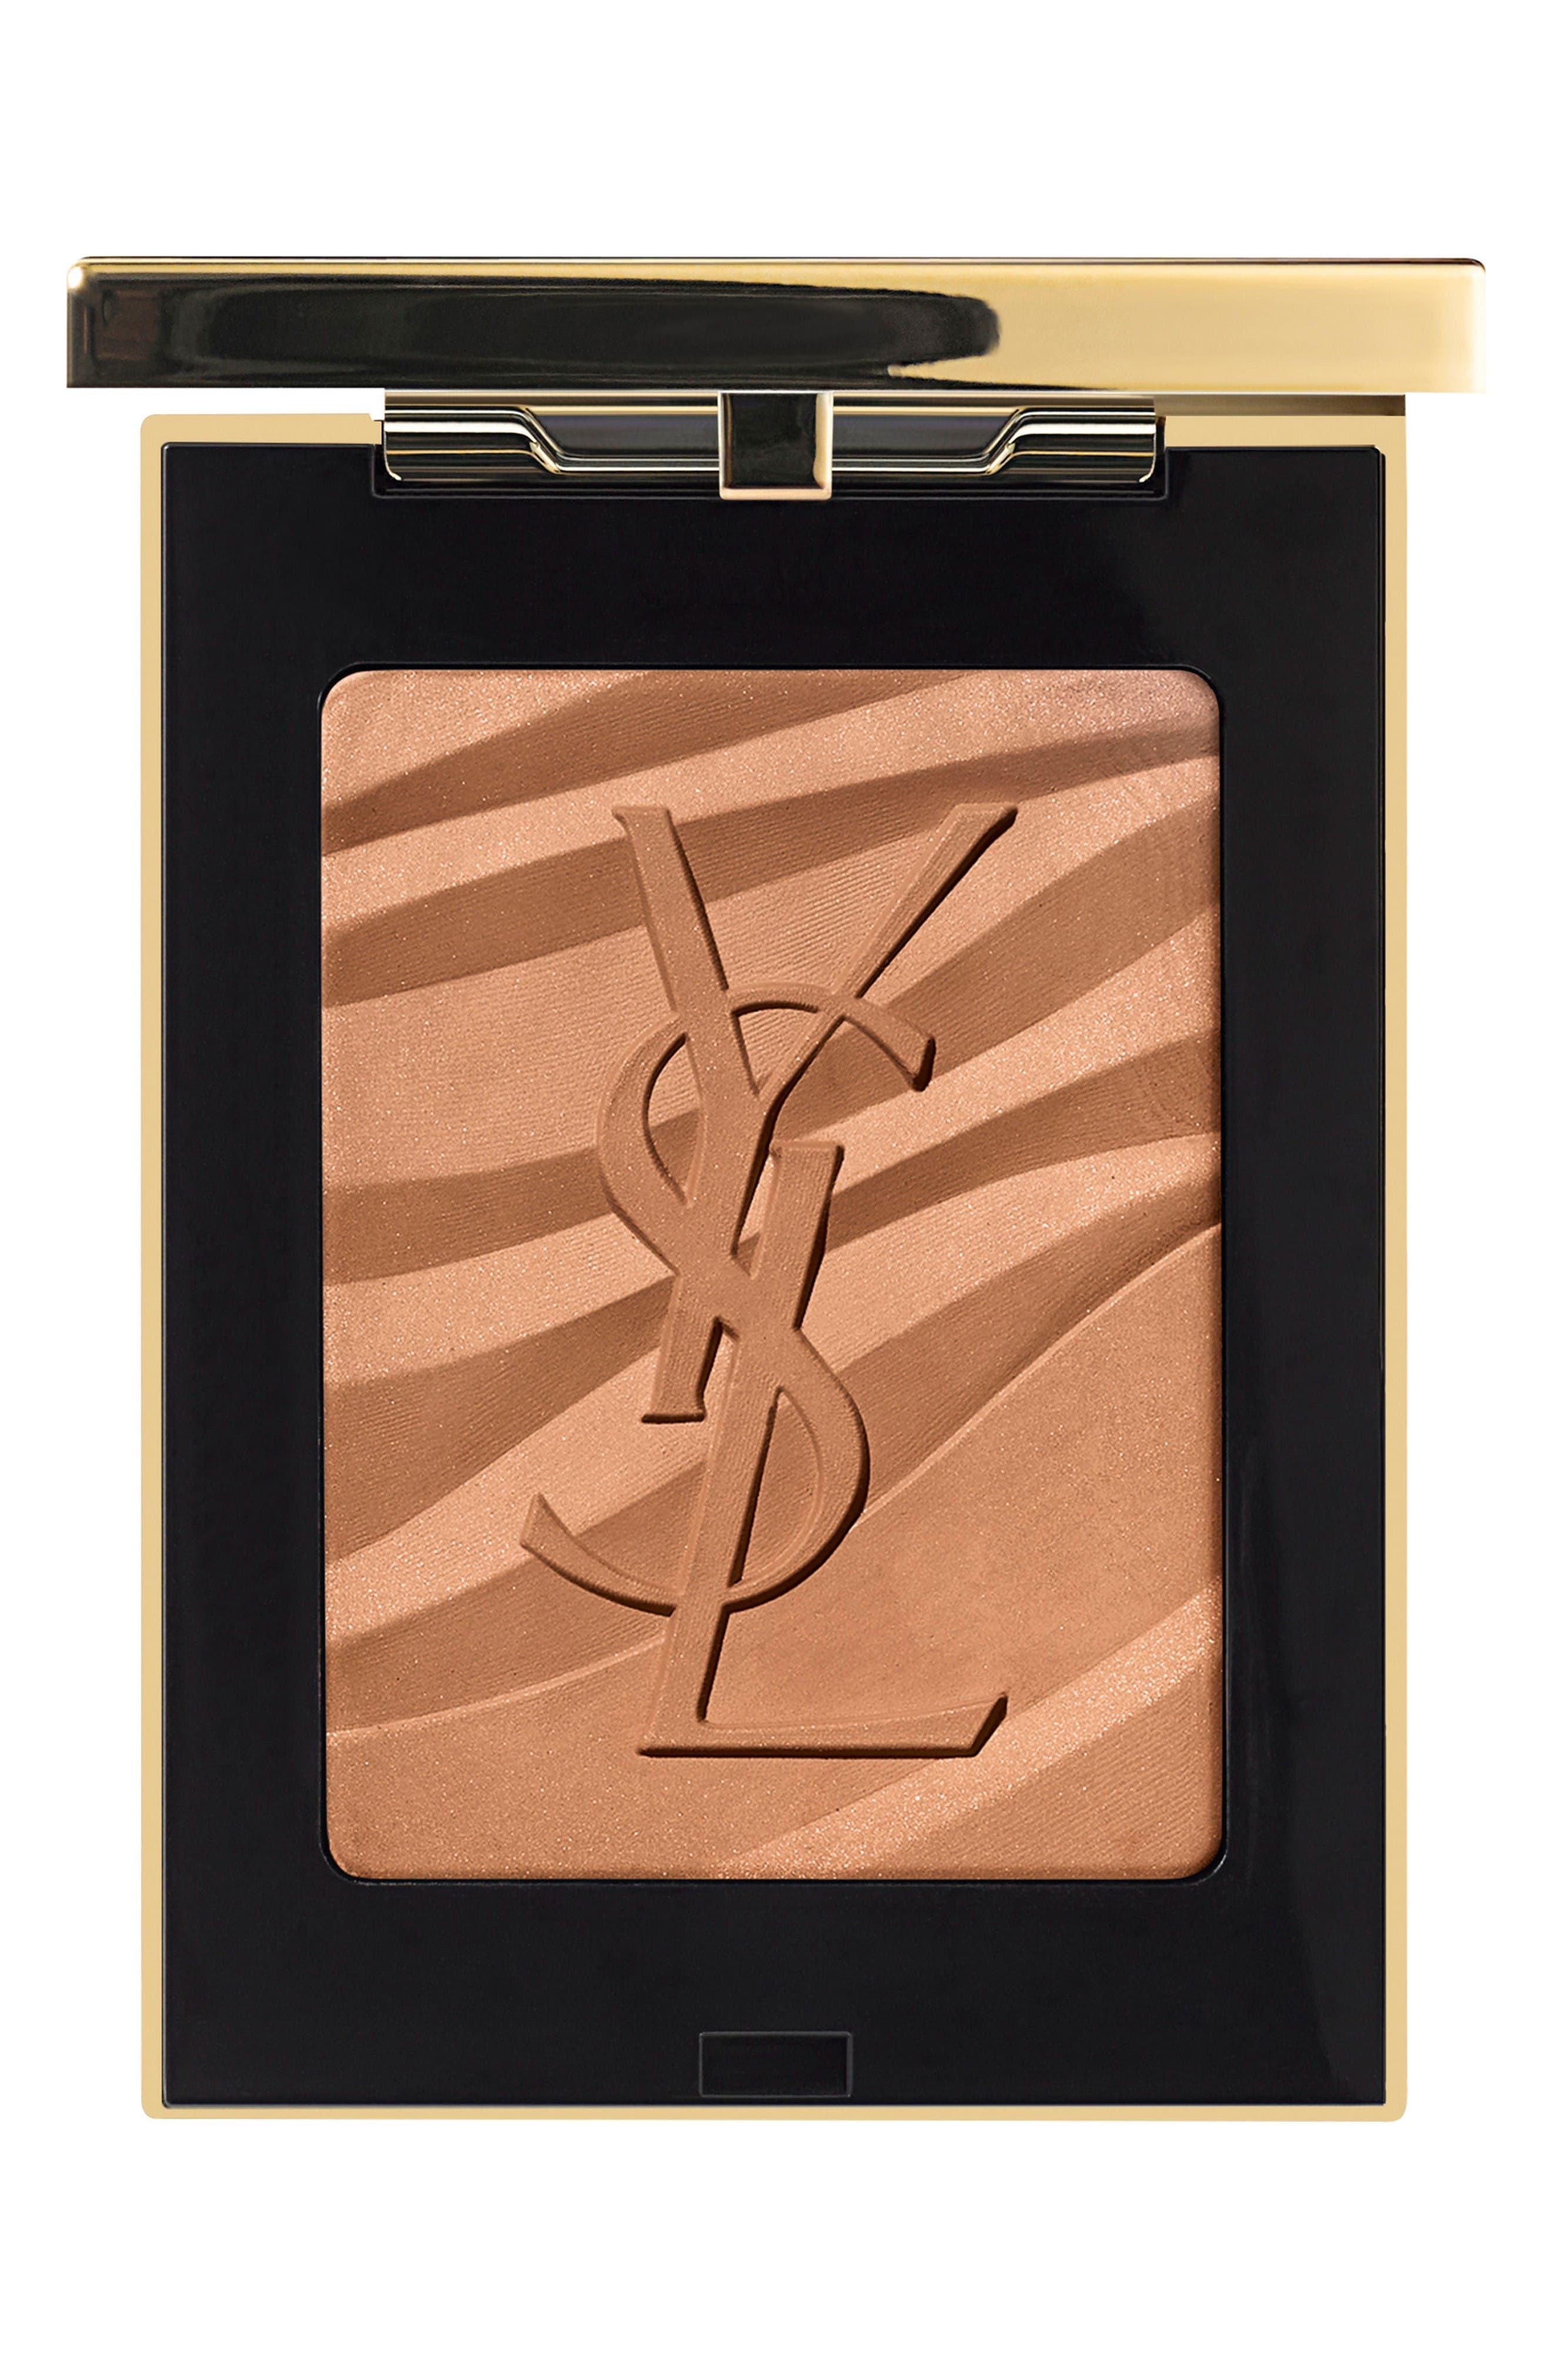 Yves Saint Laurent Solar Pop Bronzing Stones Palette (Limited Edition)